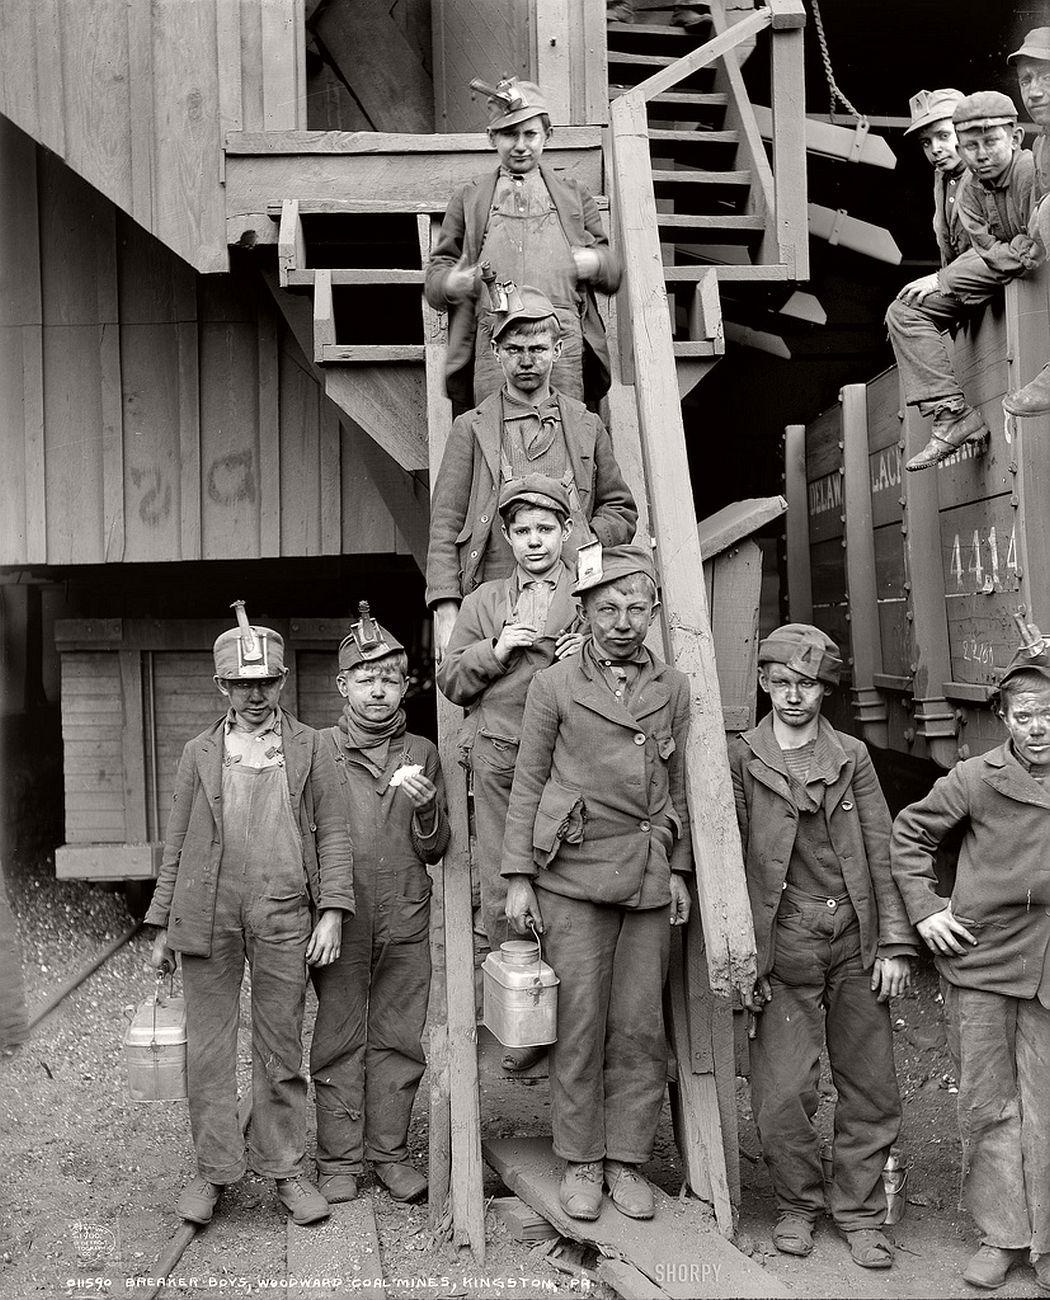 Coal breakers in break-time, Pennsylvania, 1911